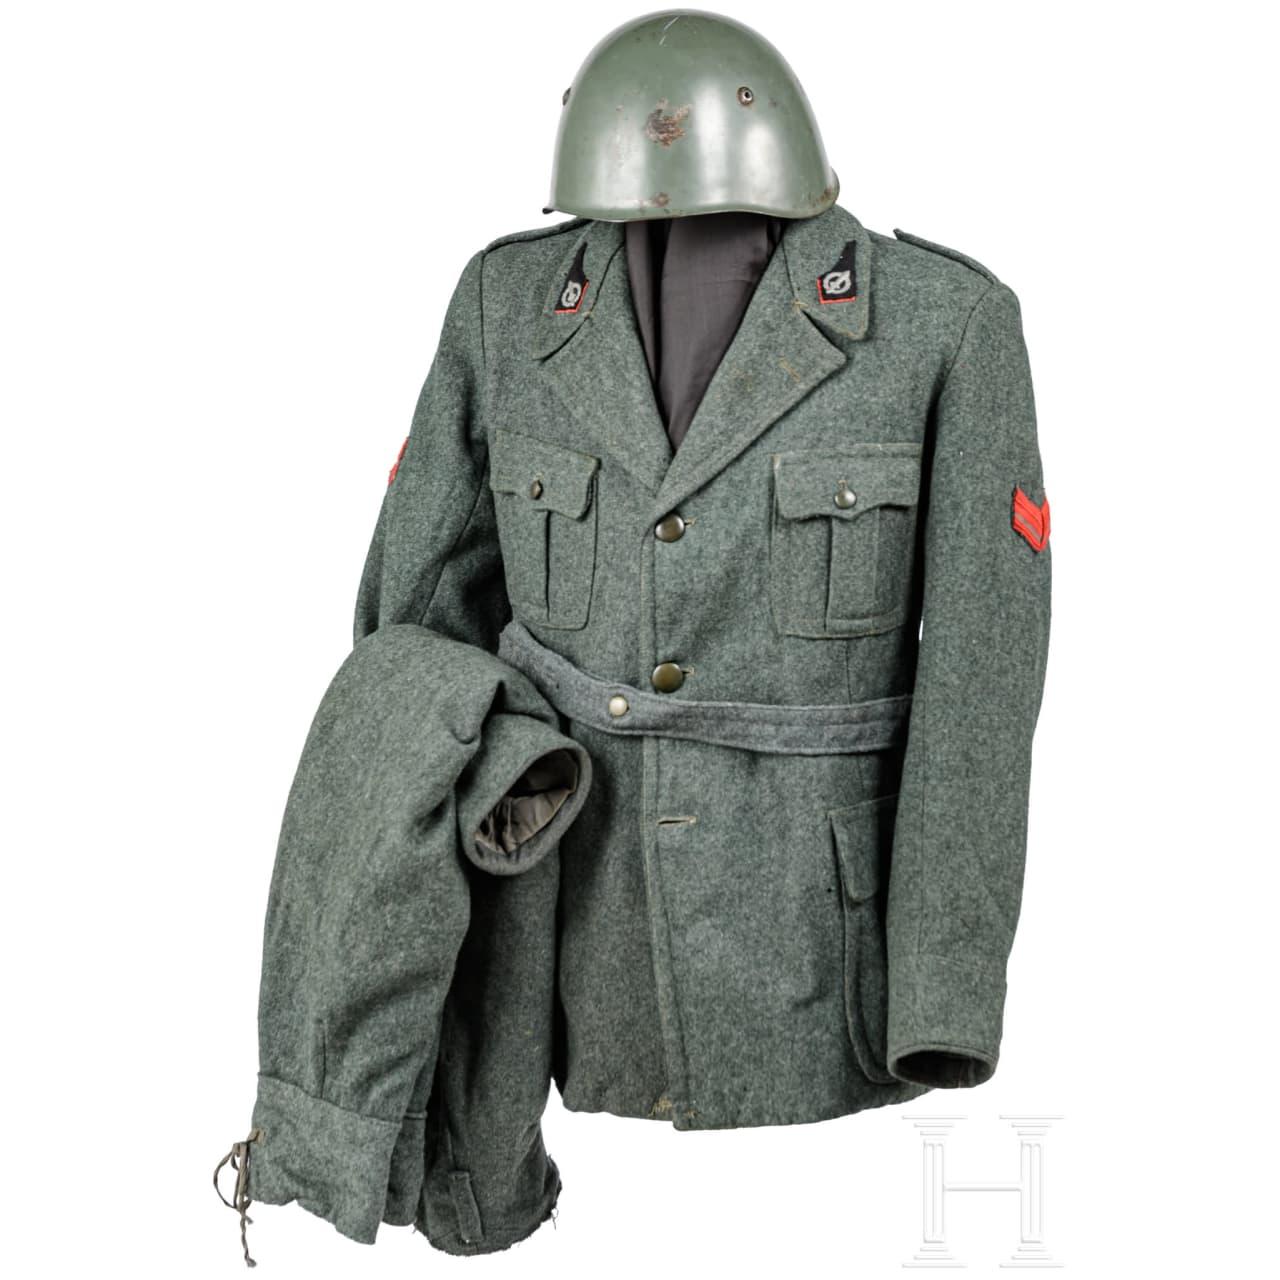 Uniformensemble eines Soldaten der Repubblica Sociale Italiana (RSI), 1943-45